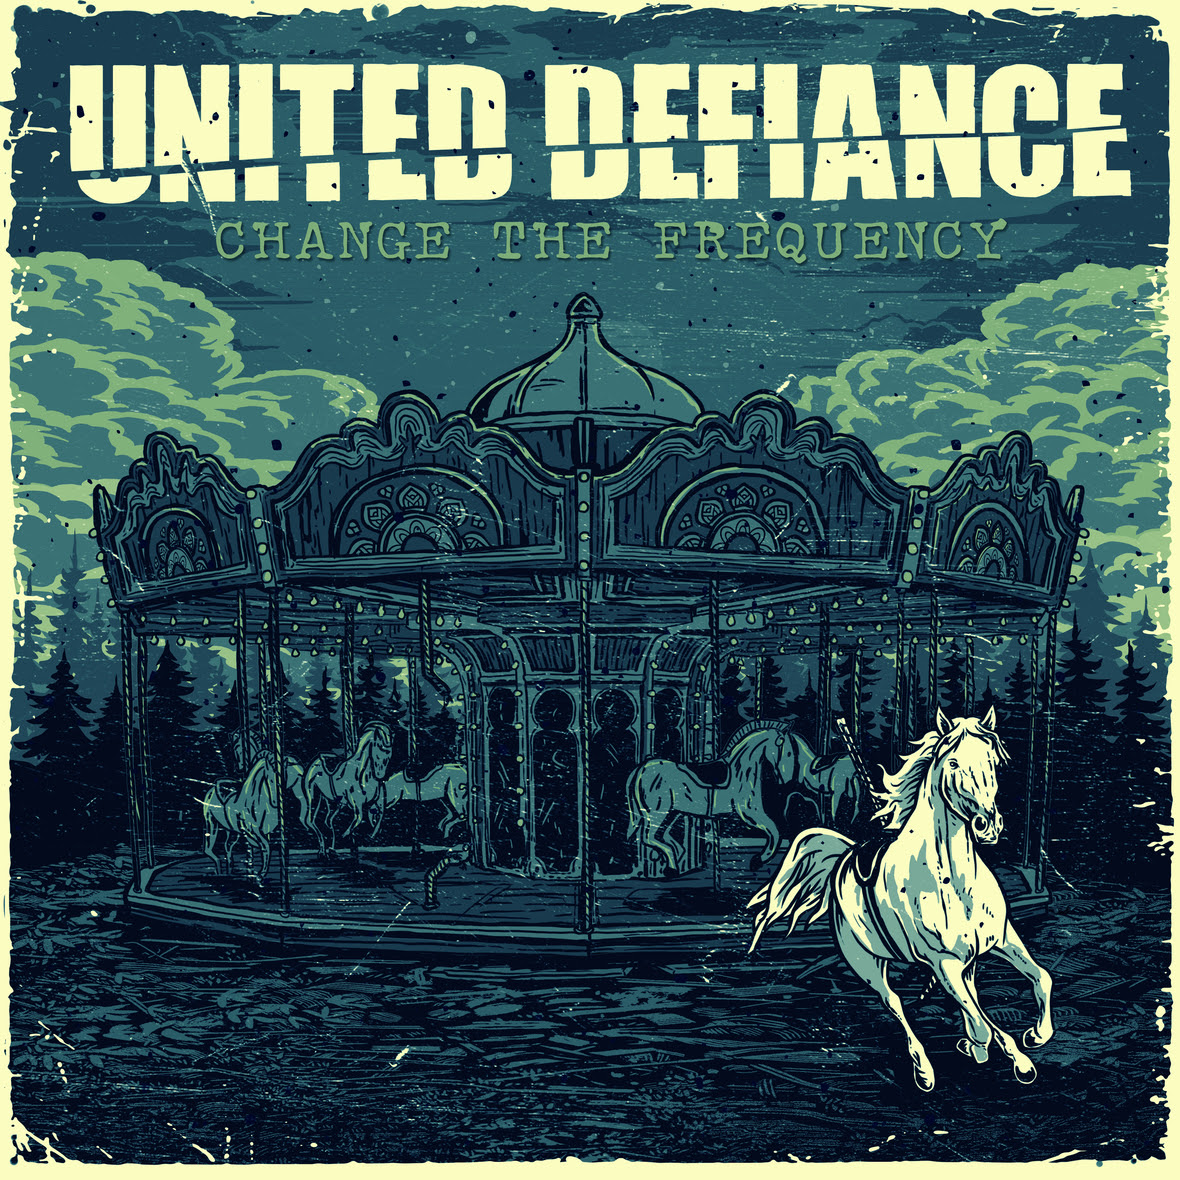 UnitedDefiance-ChangeTheFrequencyCover